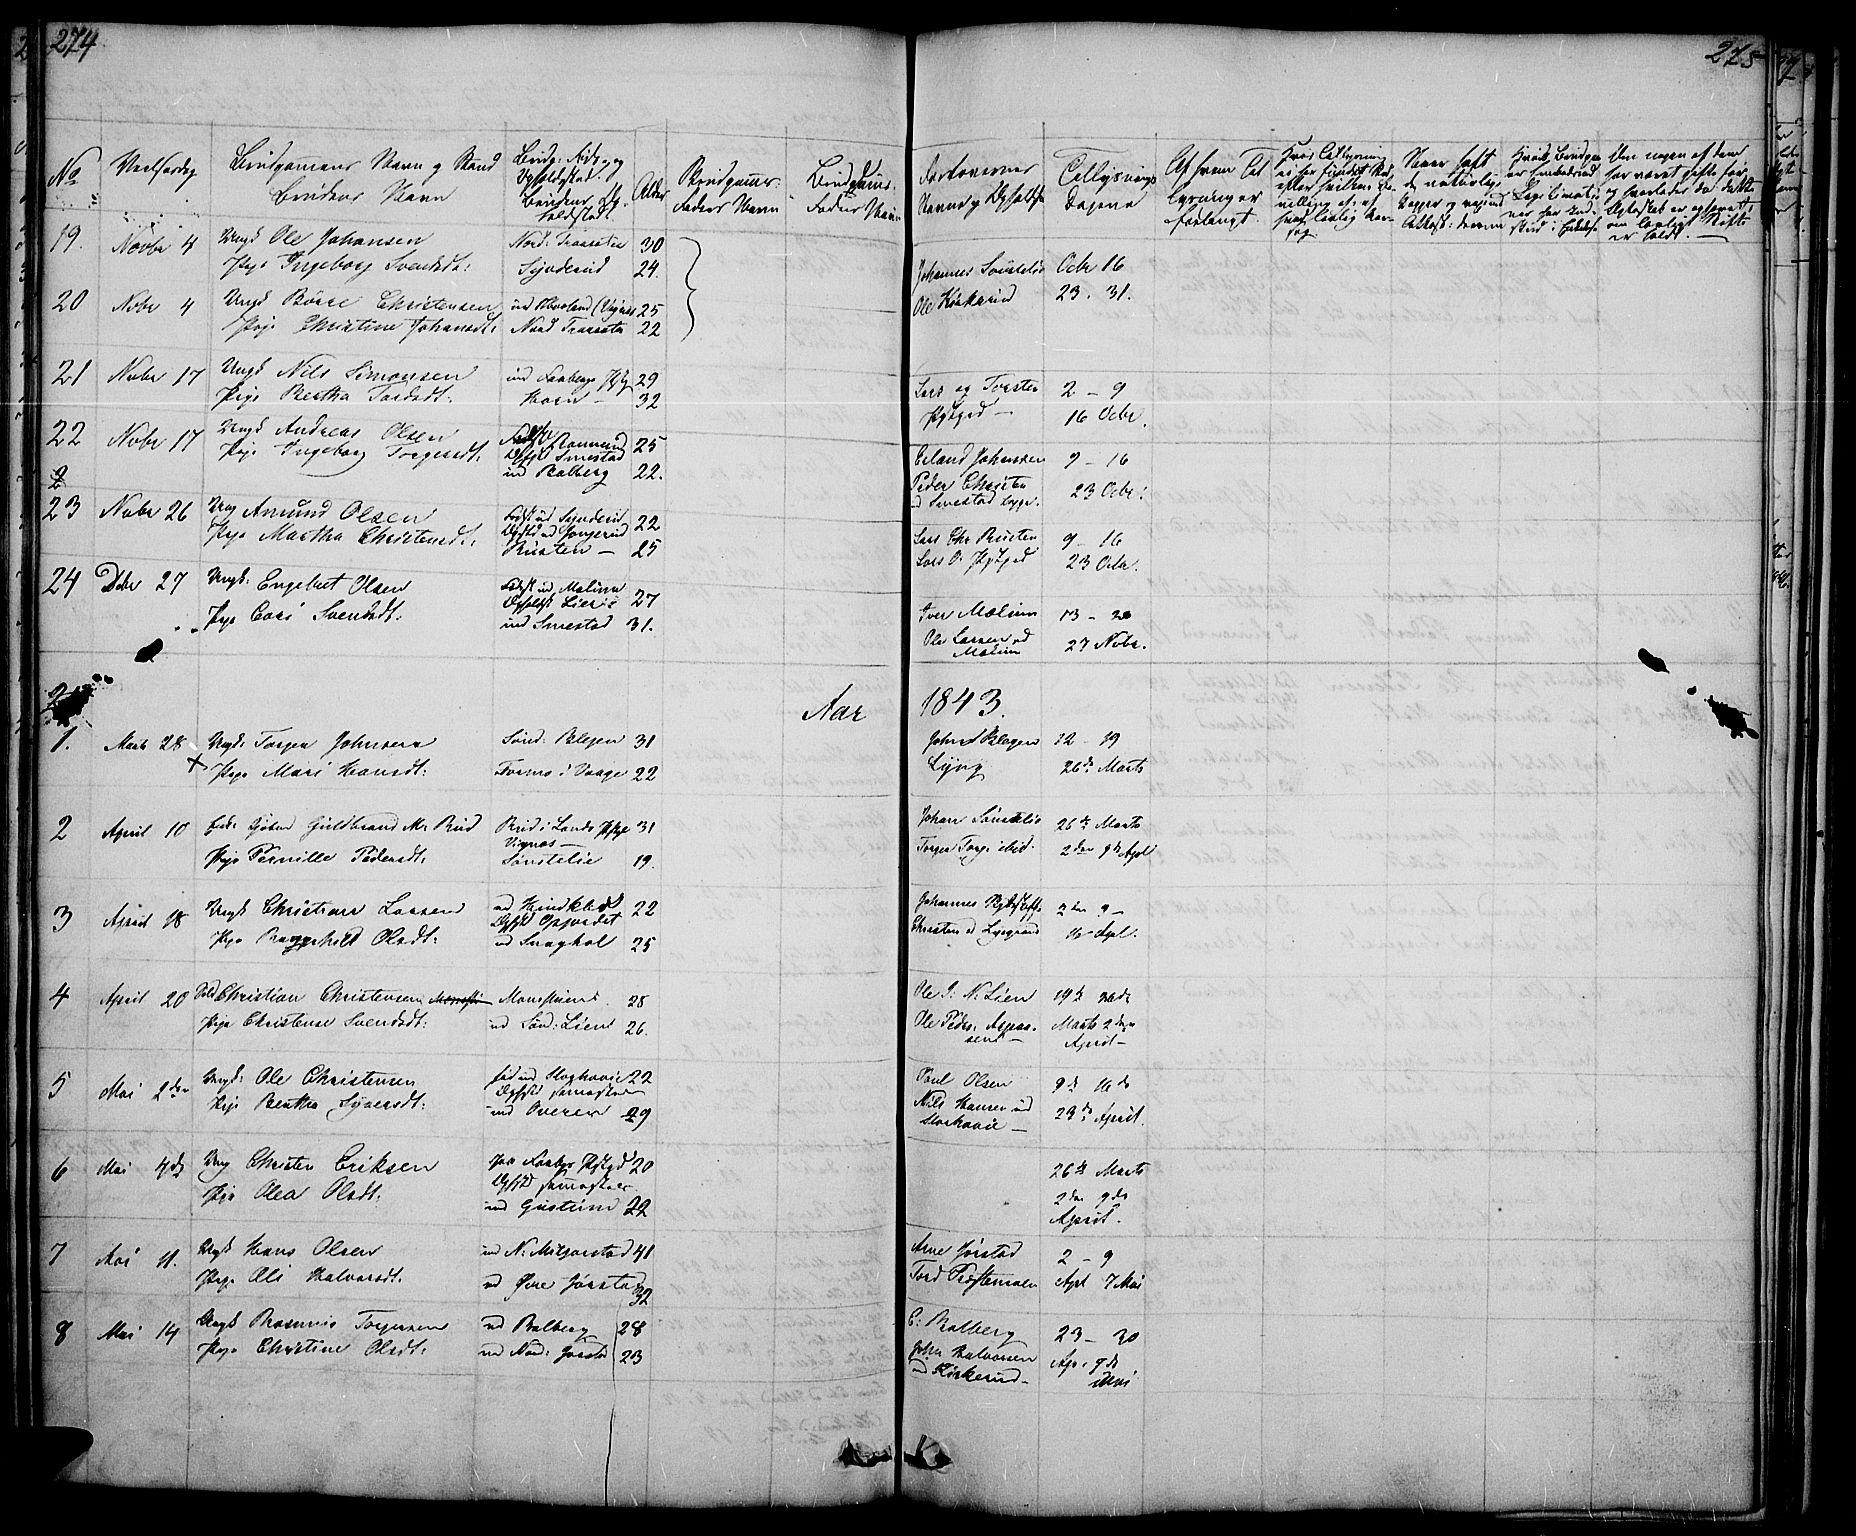 SAH, Fåberg prestekontor, Klokkerbok nr. 5, 1837-1864, s. 274-275